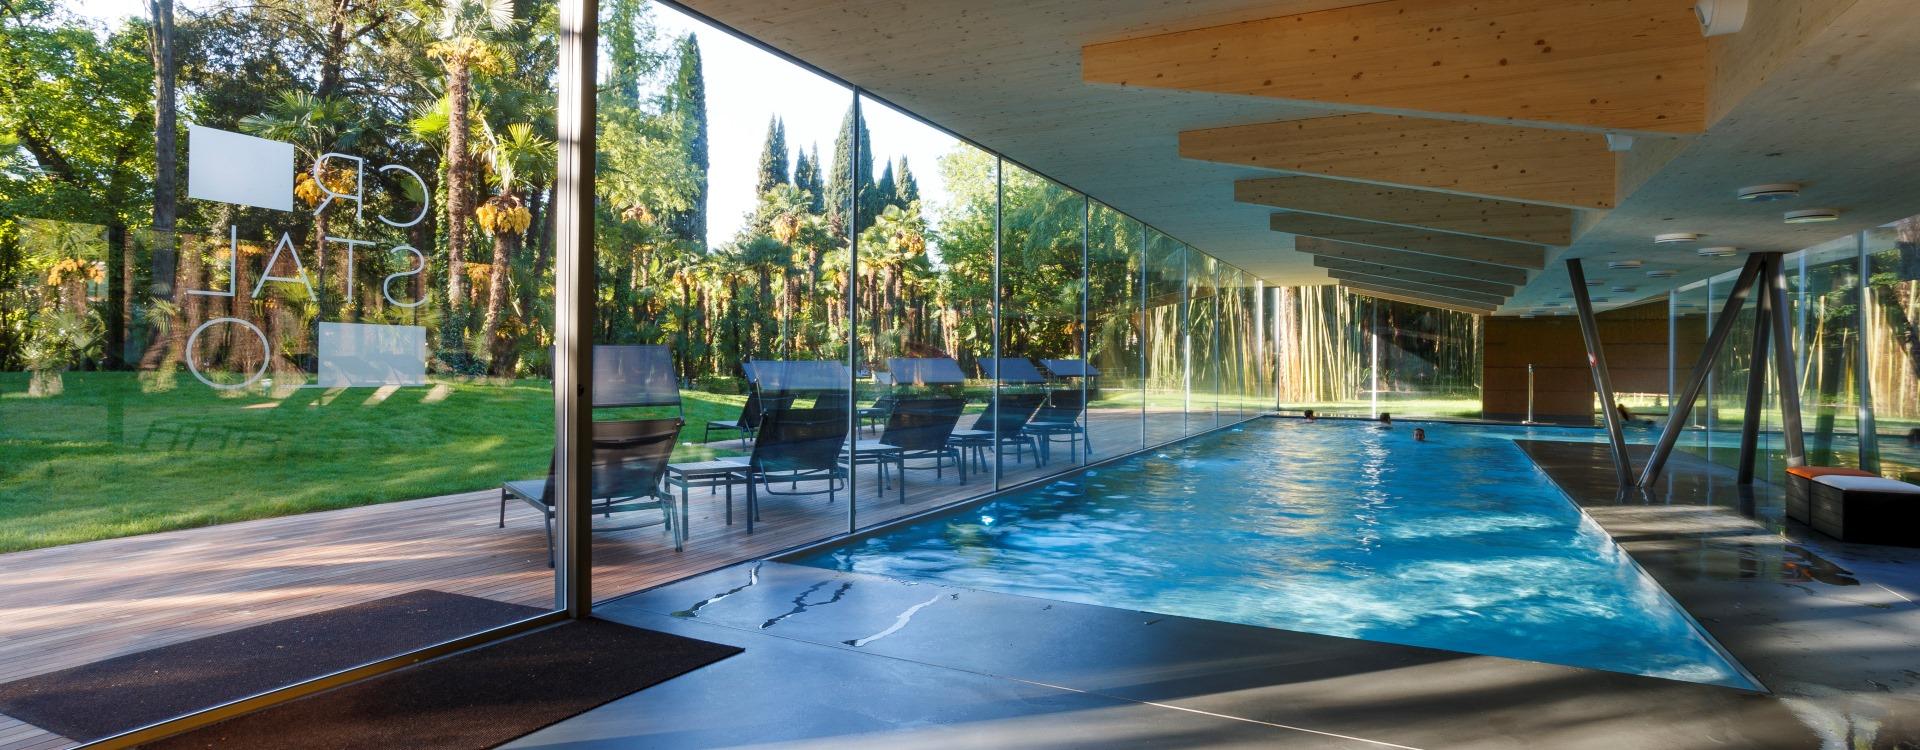 Exclusive Resort Spa 4 Star Du Lac Et Du Parc Garda Lake Italy